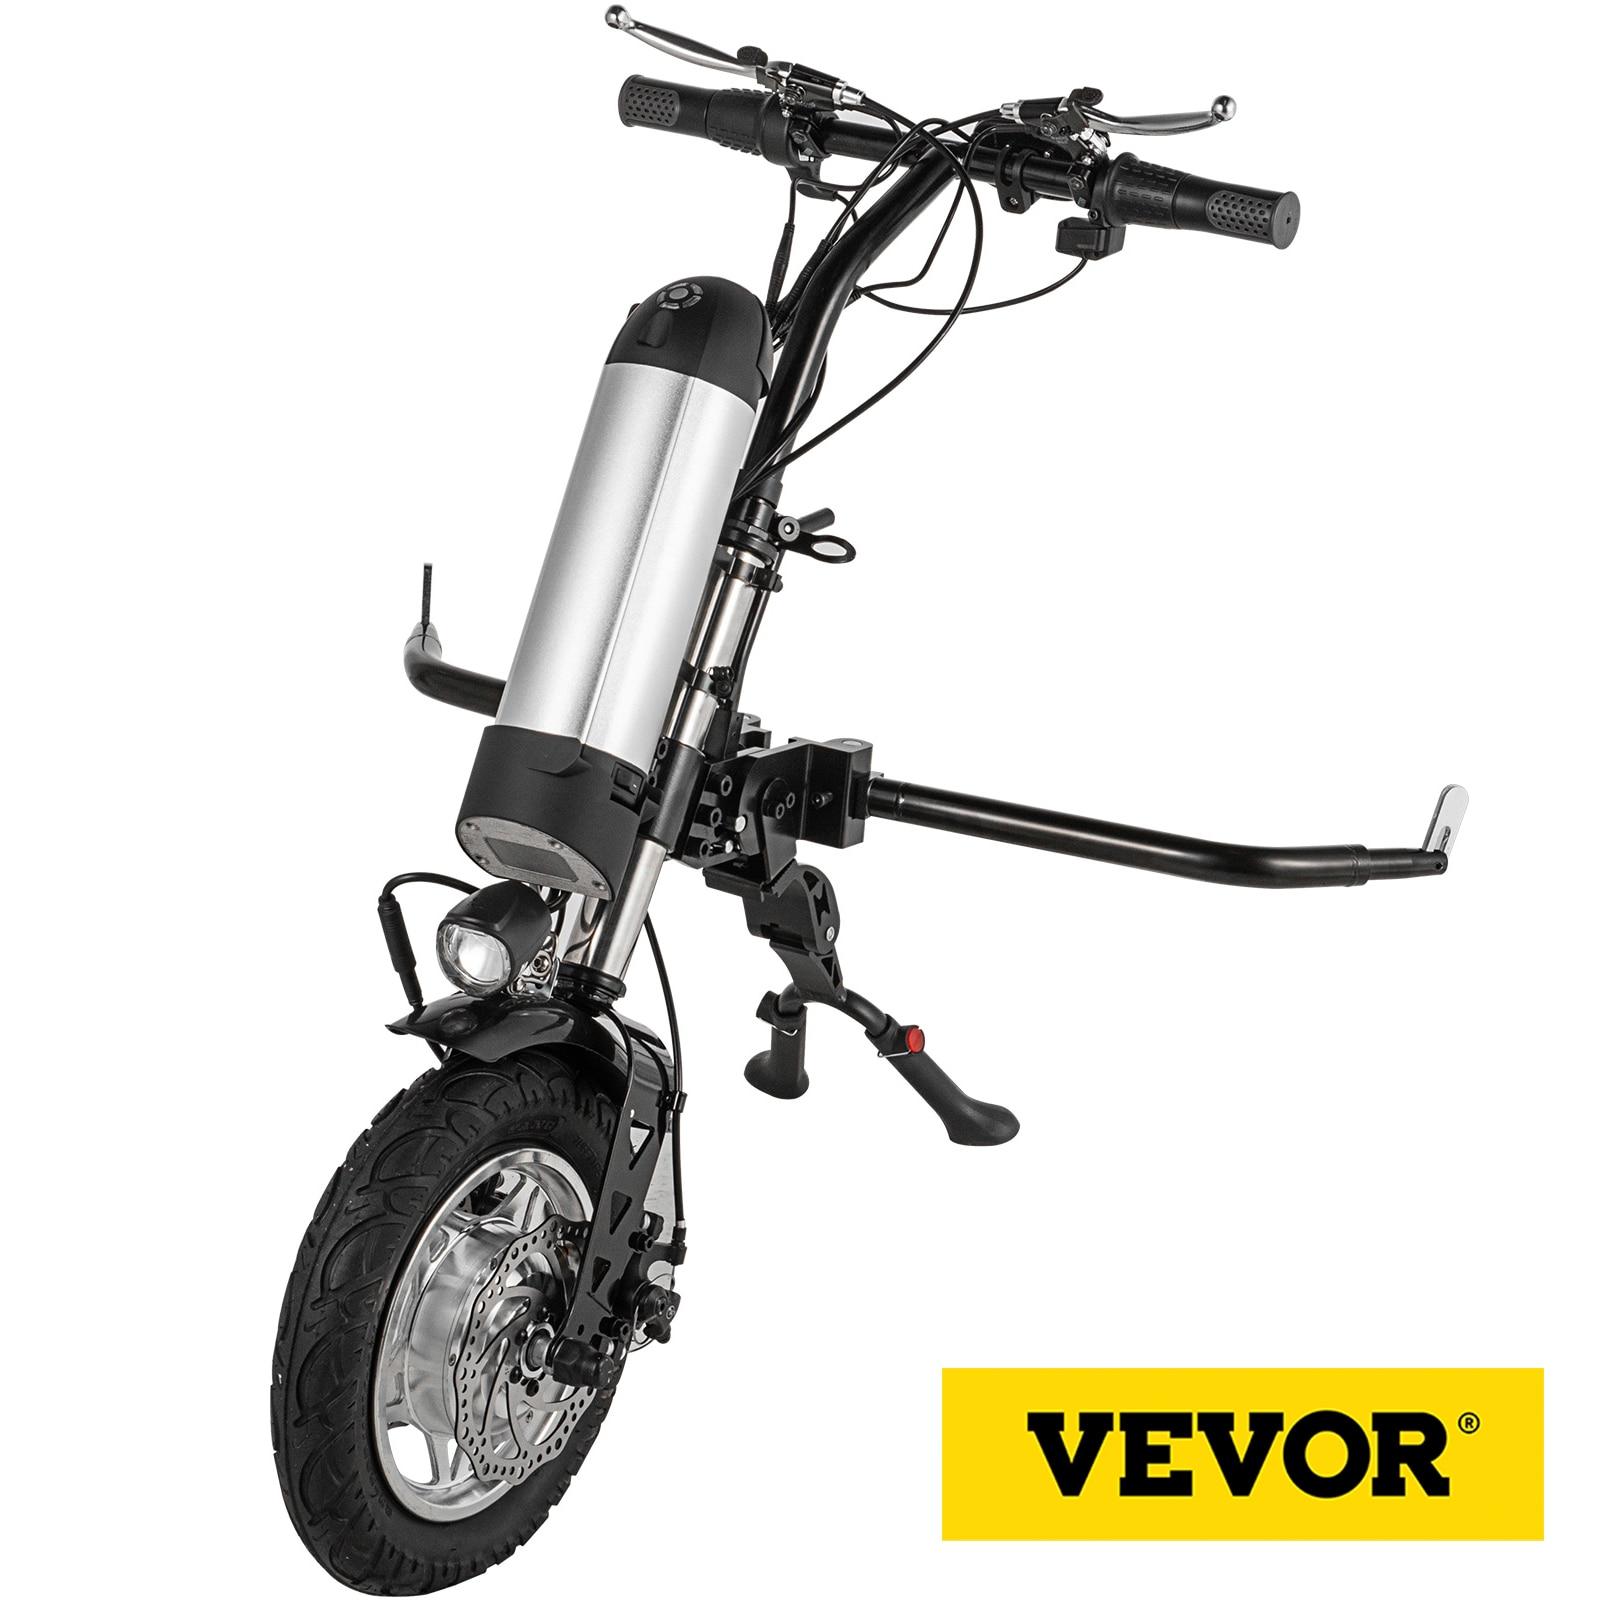 VEVOR 350 واط الكهربائية كرسي متحرك تحويل عدة جرار شاشة الكريستال السائل 36 فولت بطارية 10.4AH موتور عجلة الكهربائية كرسي متحرك Handcycle